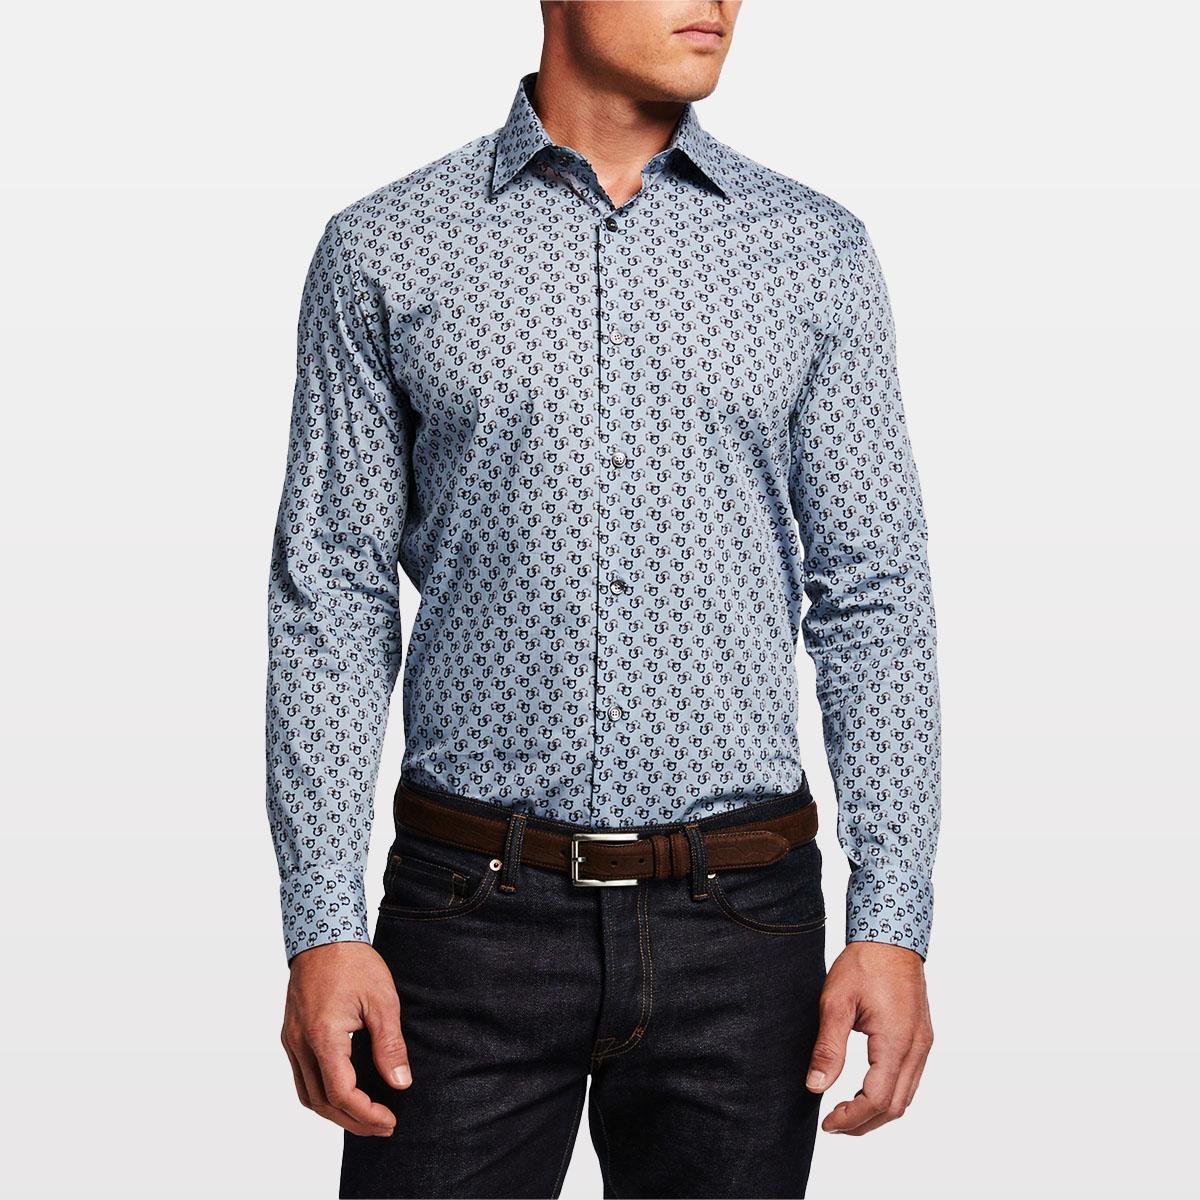 Salvatore Ferragamo Men's Gancini-Print Sport Shirt